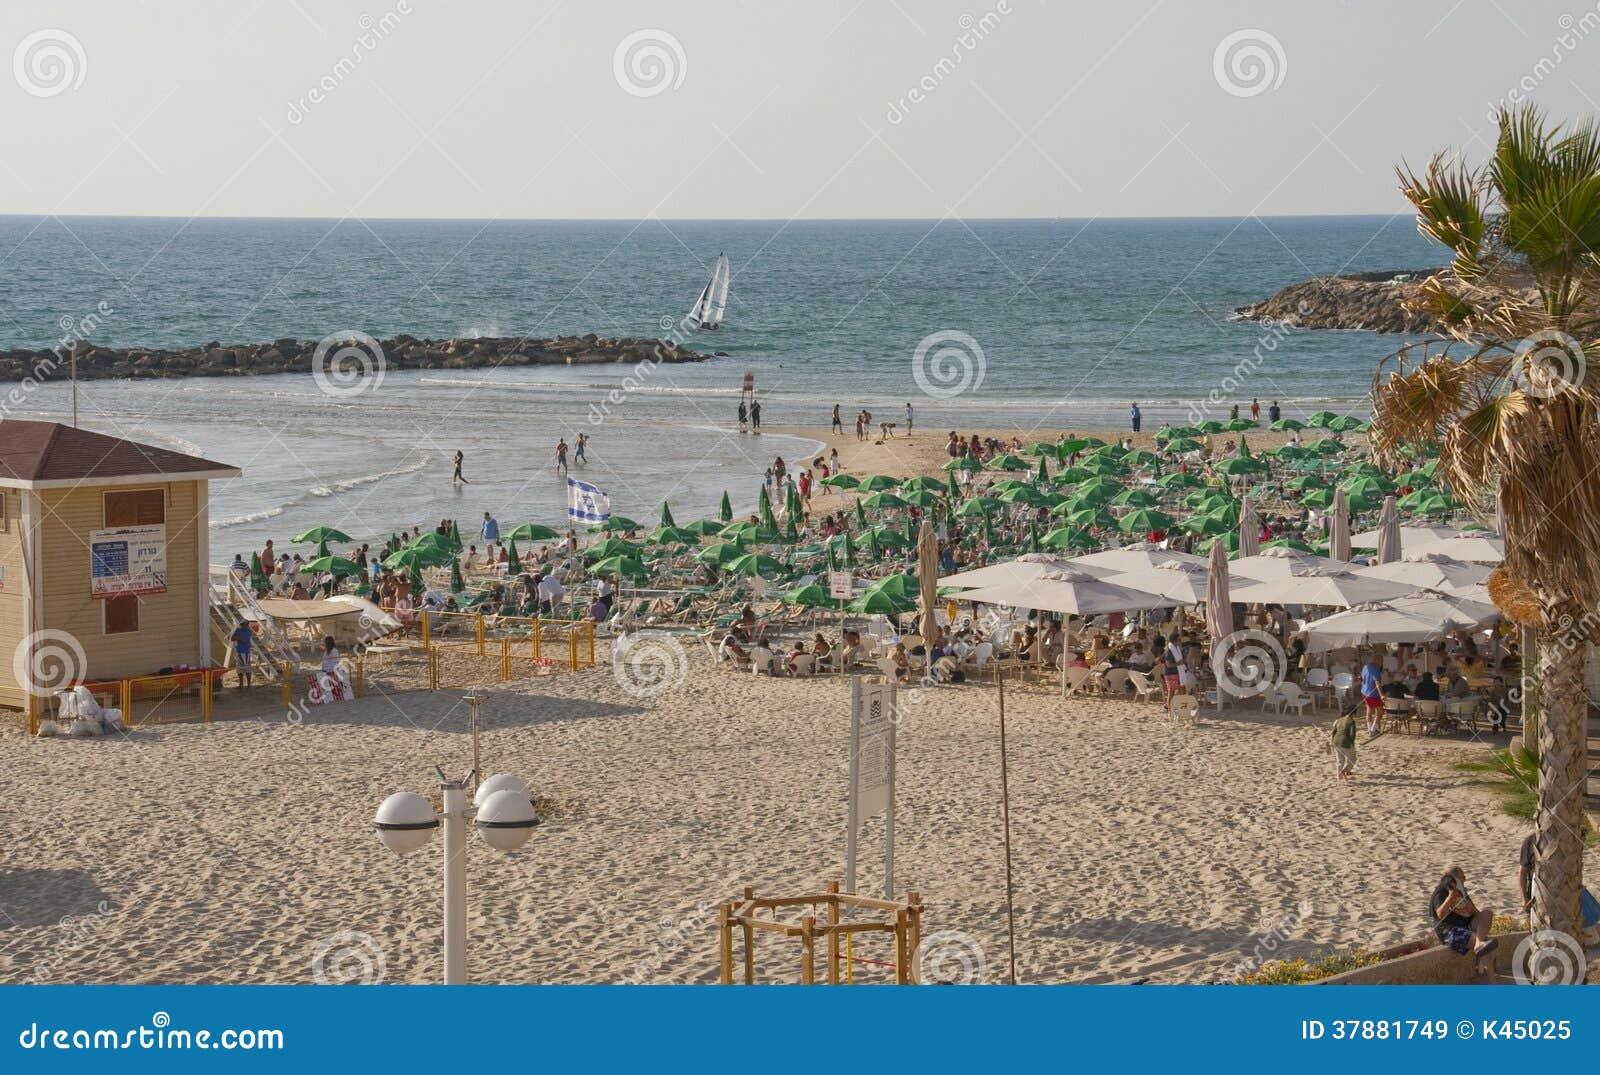 City beach in Tel- Aviv Israel